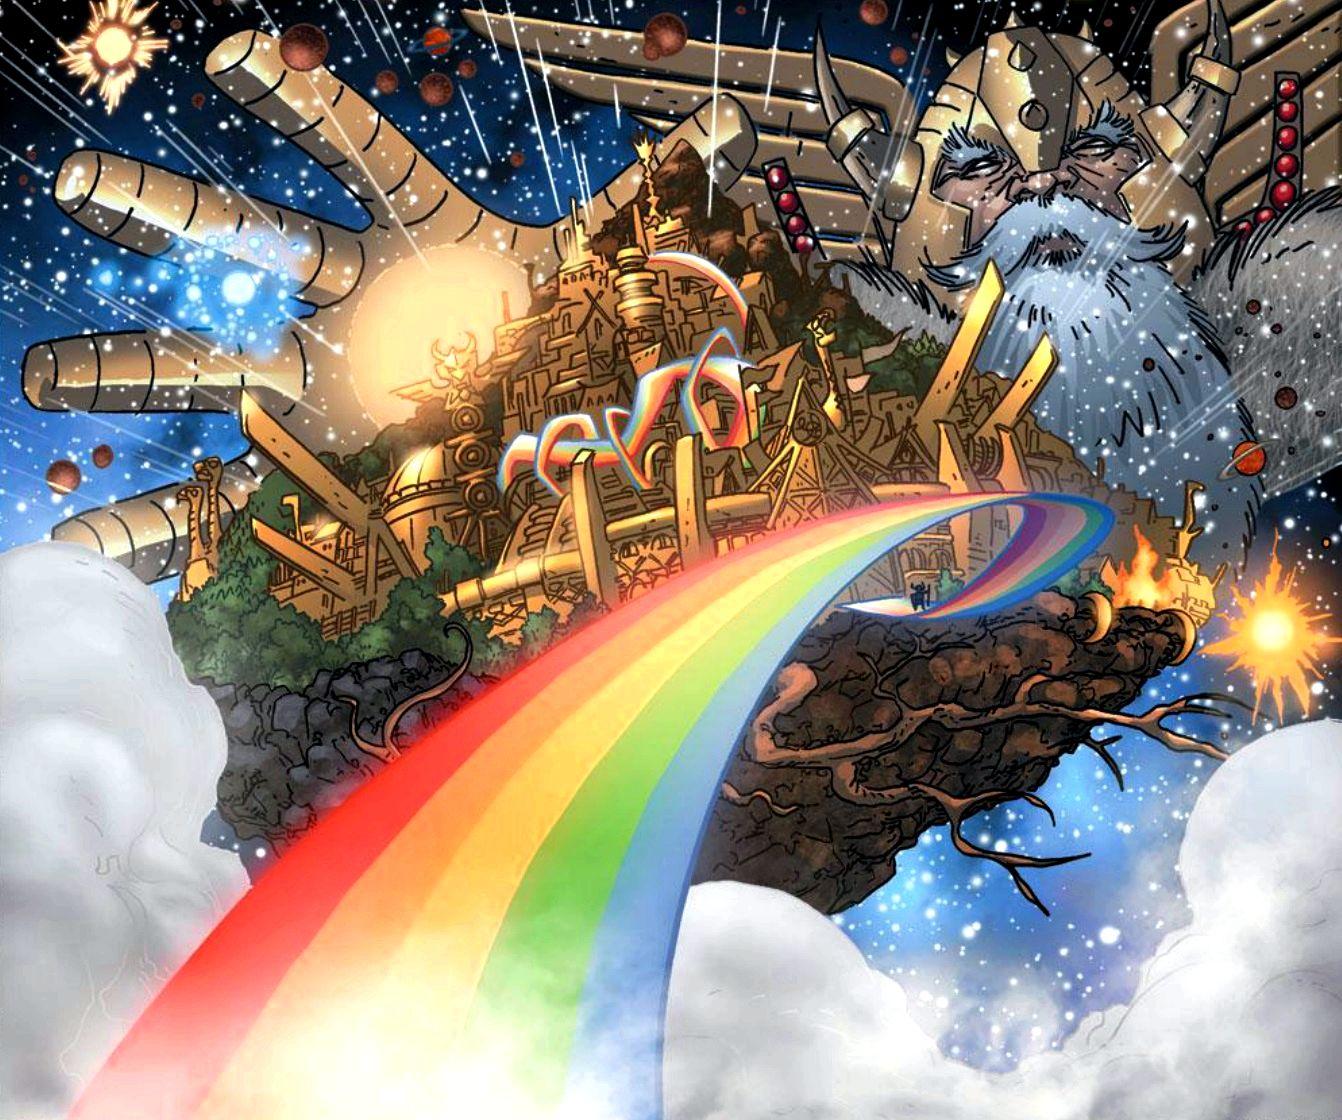 Asgard (marvel comics) invades your avatar's world | ASGARD